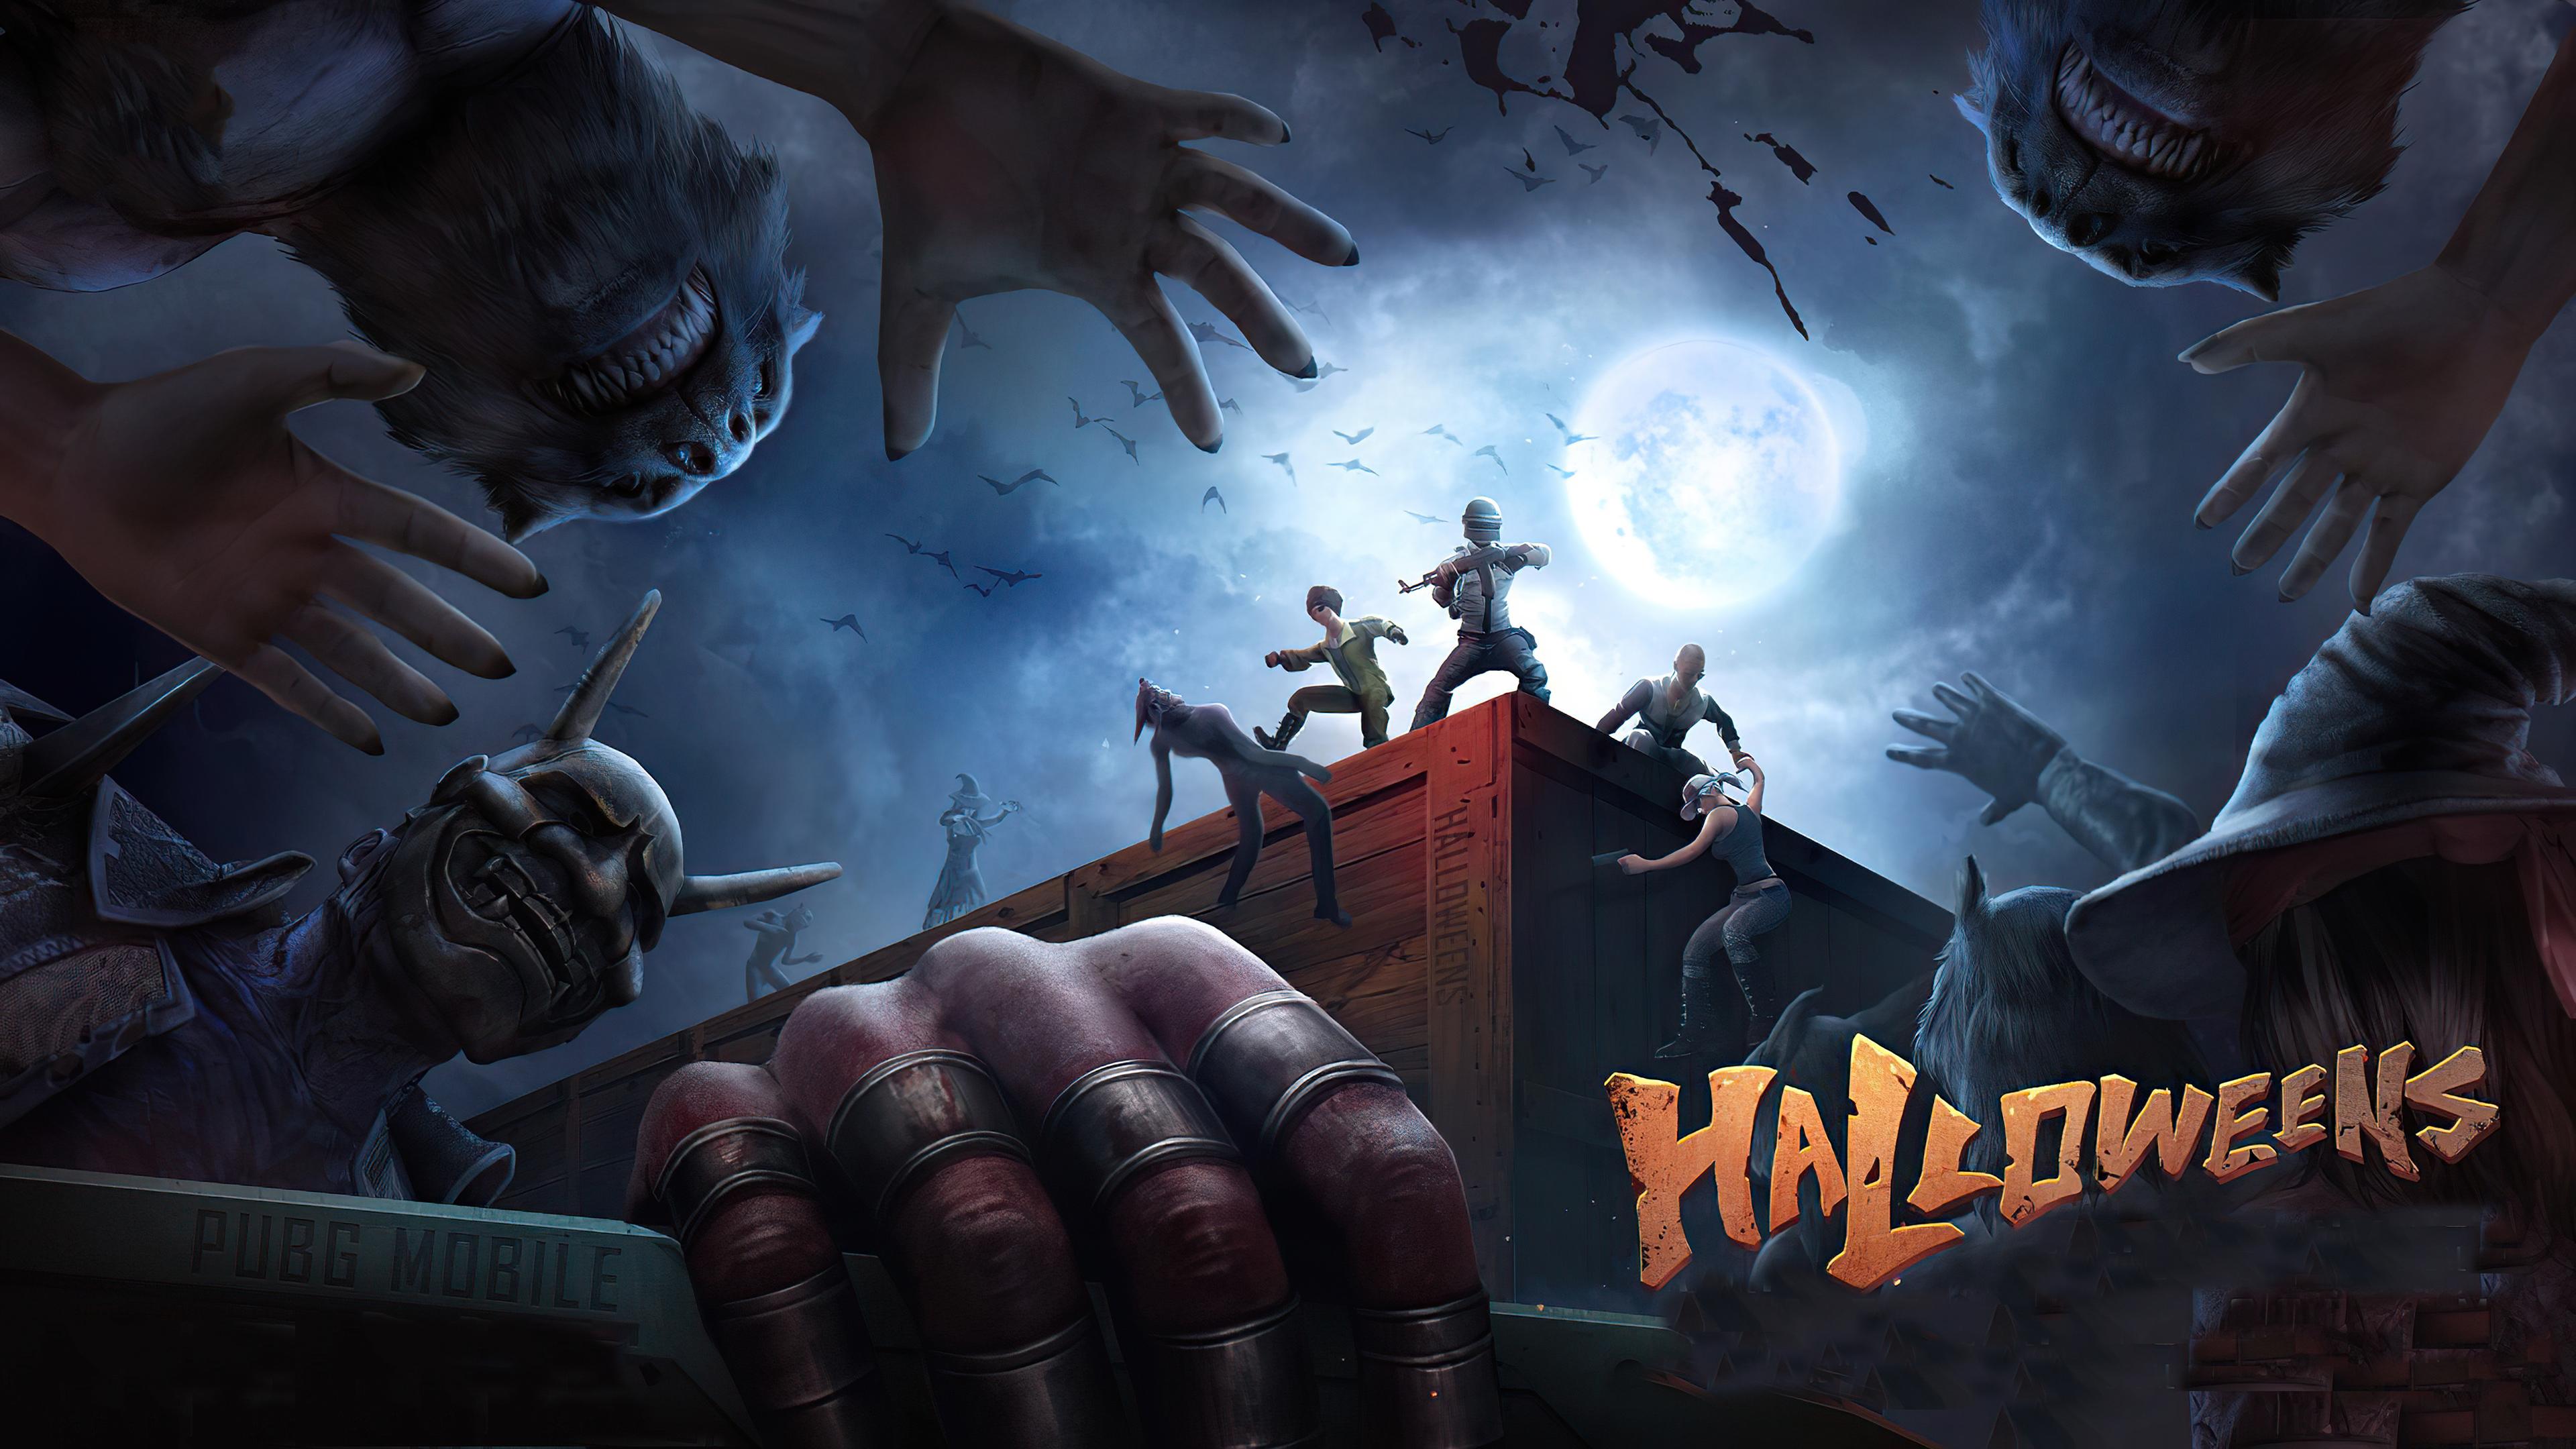 pubg halloween infection mode 4k 1614860952 - Pubg Halloween Infection Mode 4k - Pubg Halloween Infection Mode 4k wallpapers